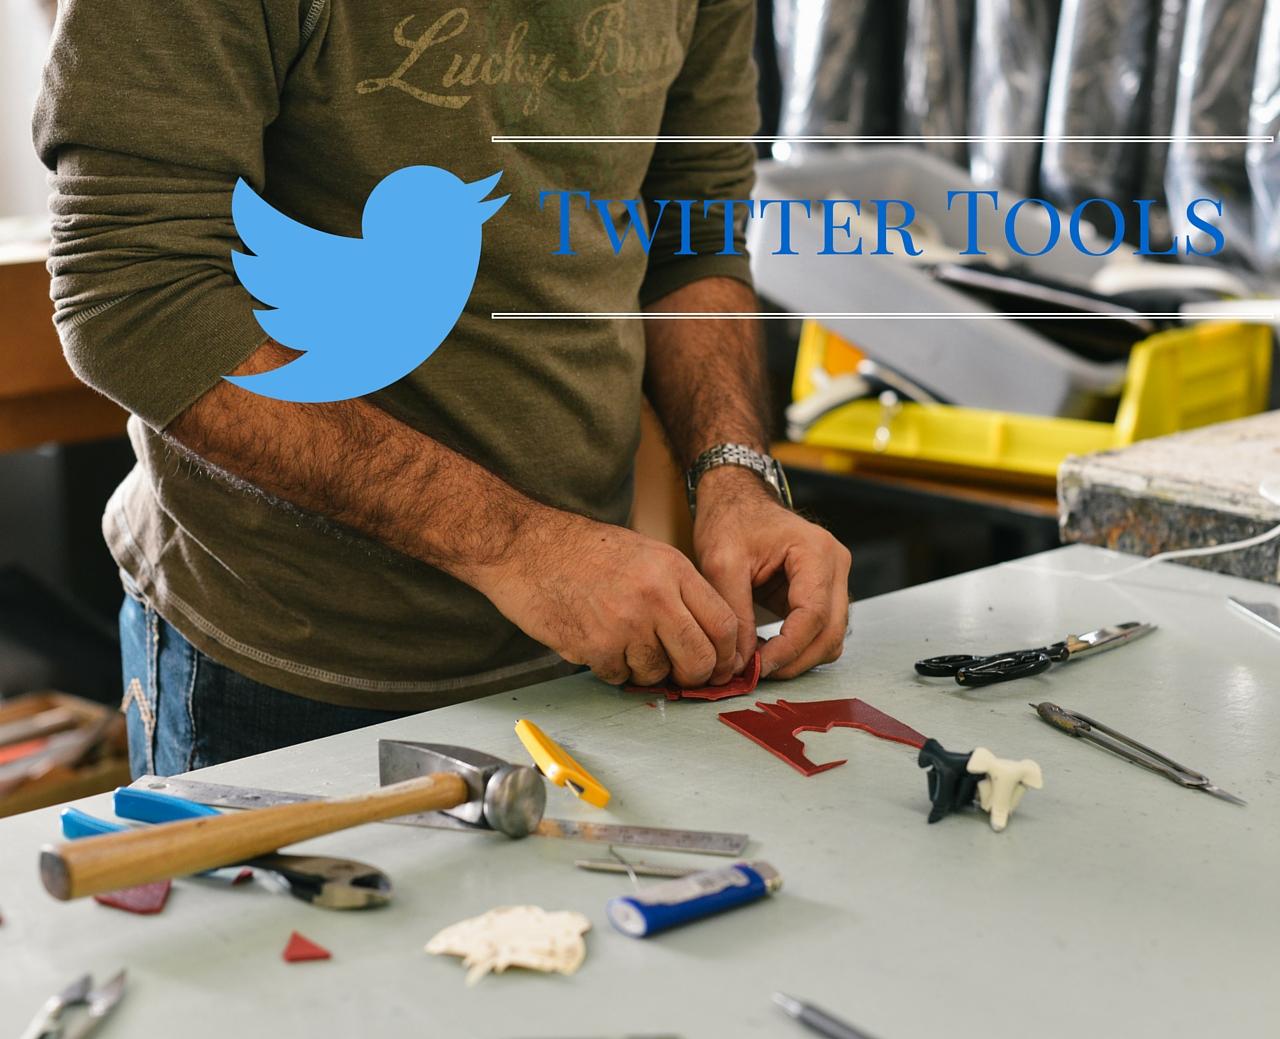 Twitter Tools.jpg